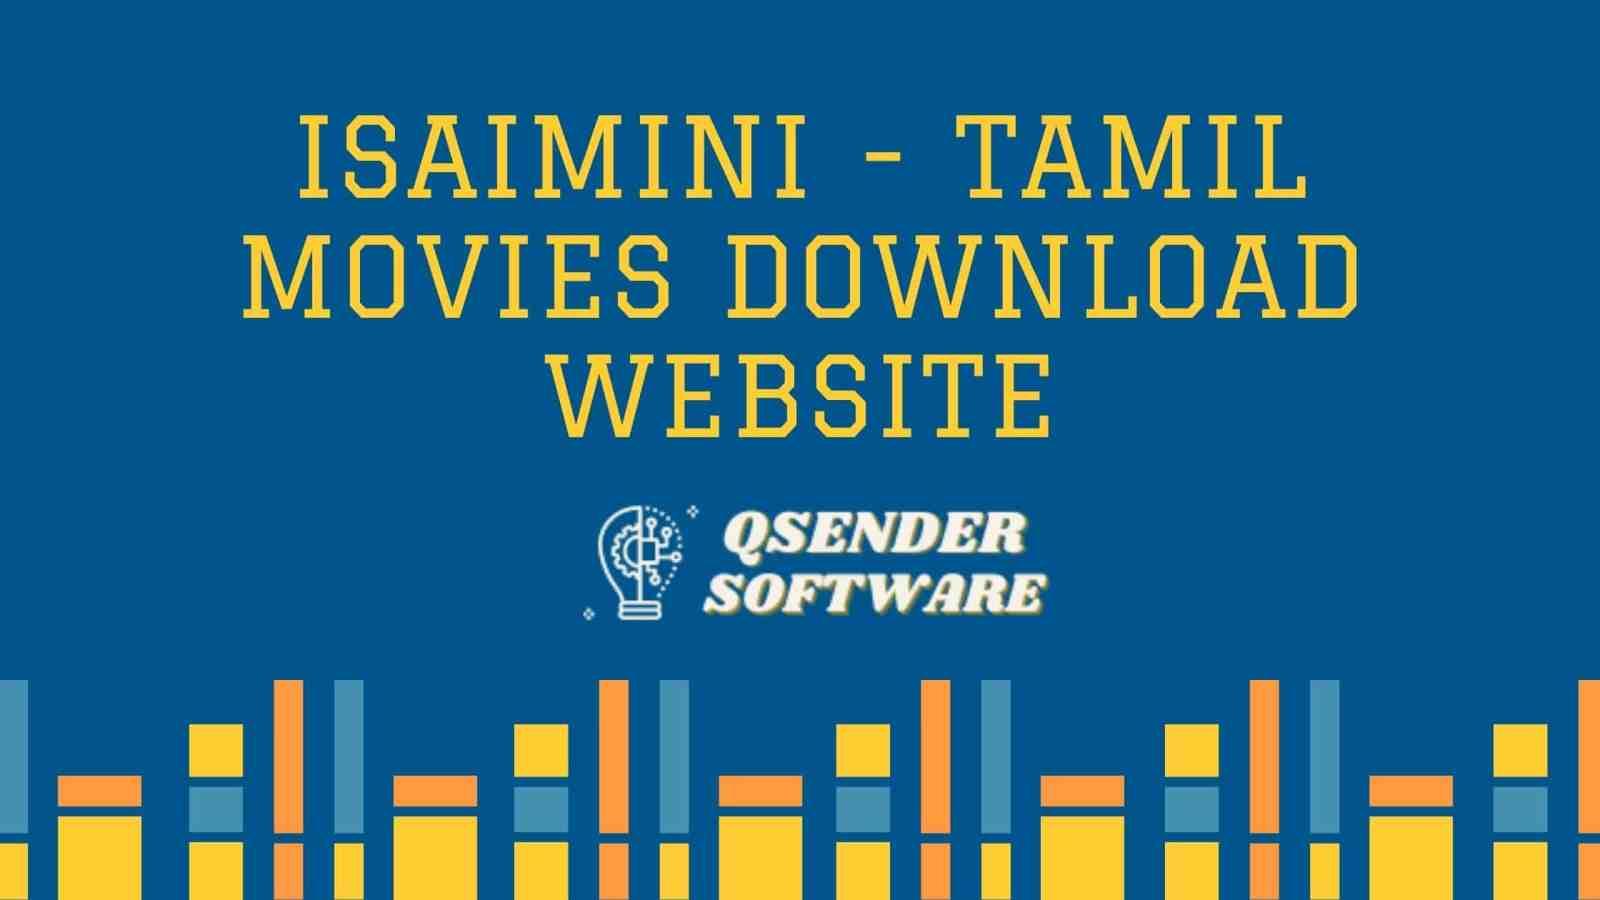 Isaimini - Tamil Movies